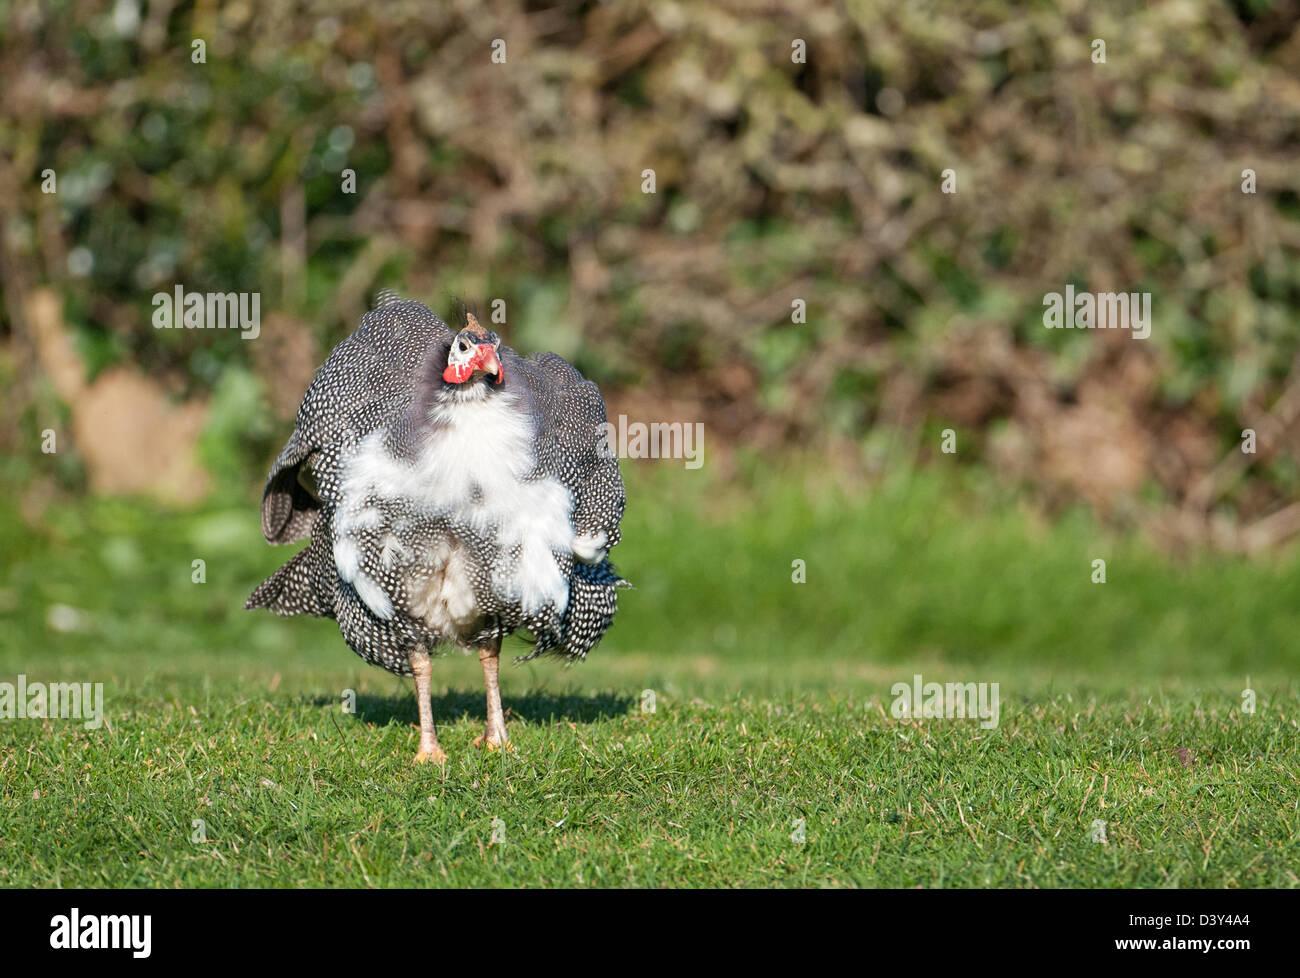 Helmeted Guinea fowl, Numida meleagris. - Stock Image